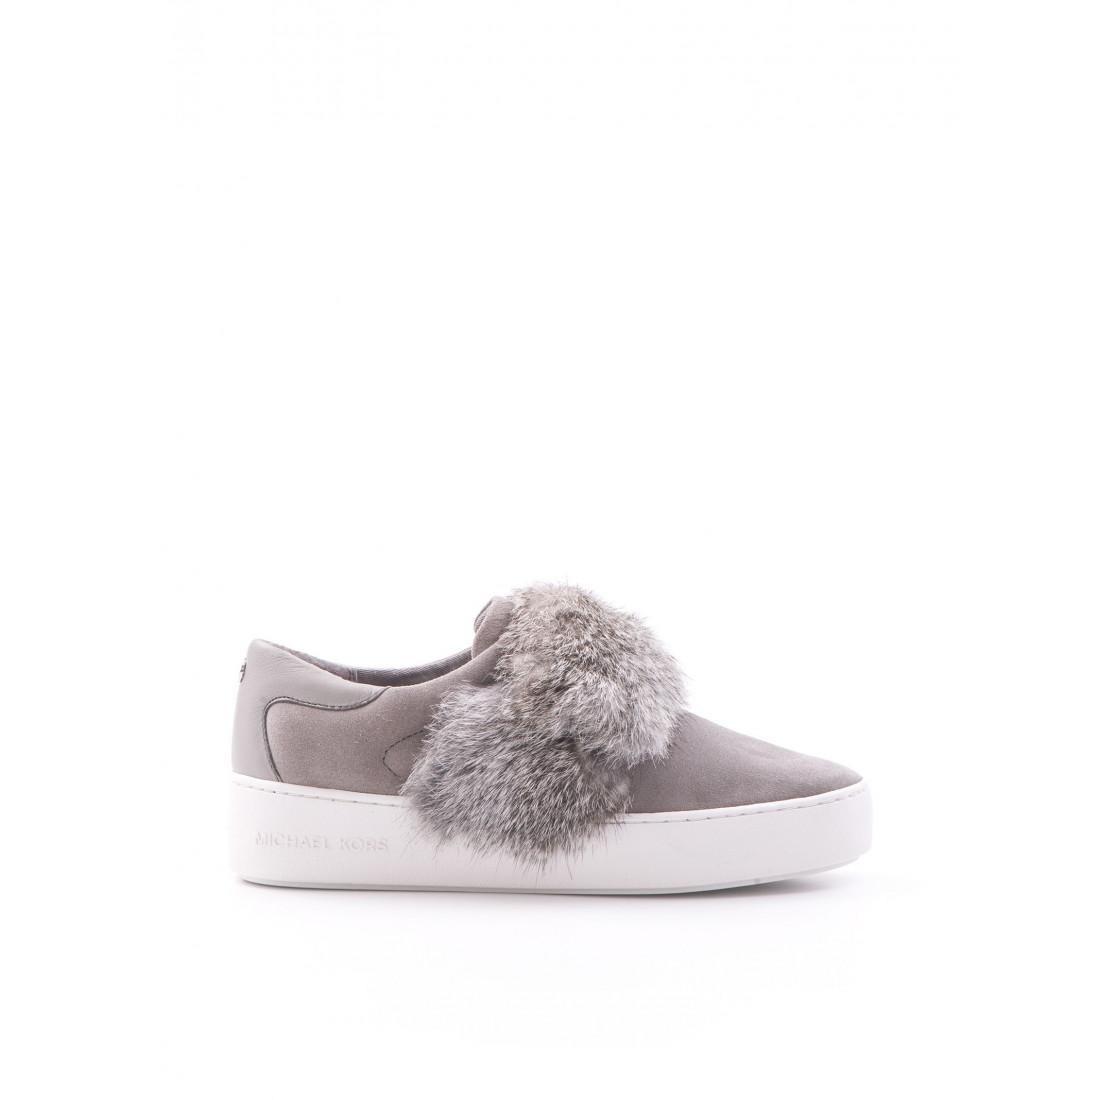 sneakers donna michael kors 43f6mvfp1s081 maven pearl grey 947